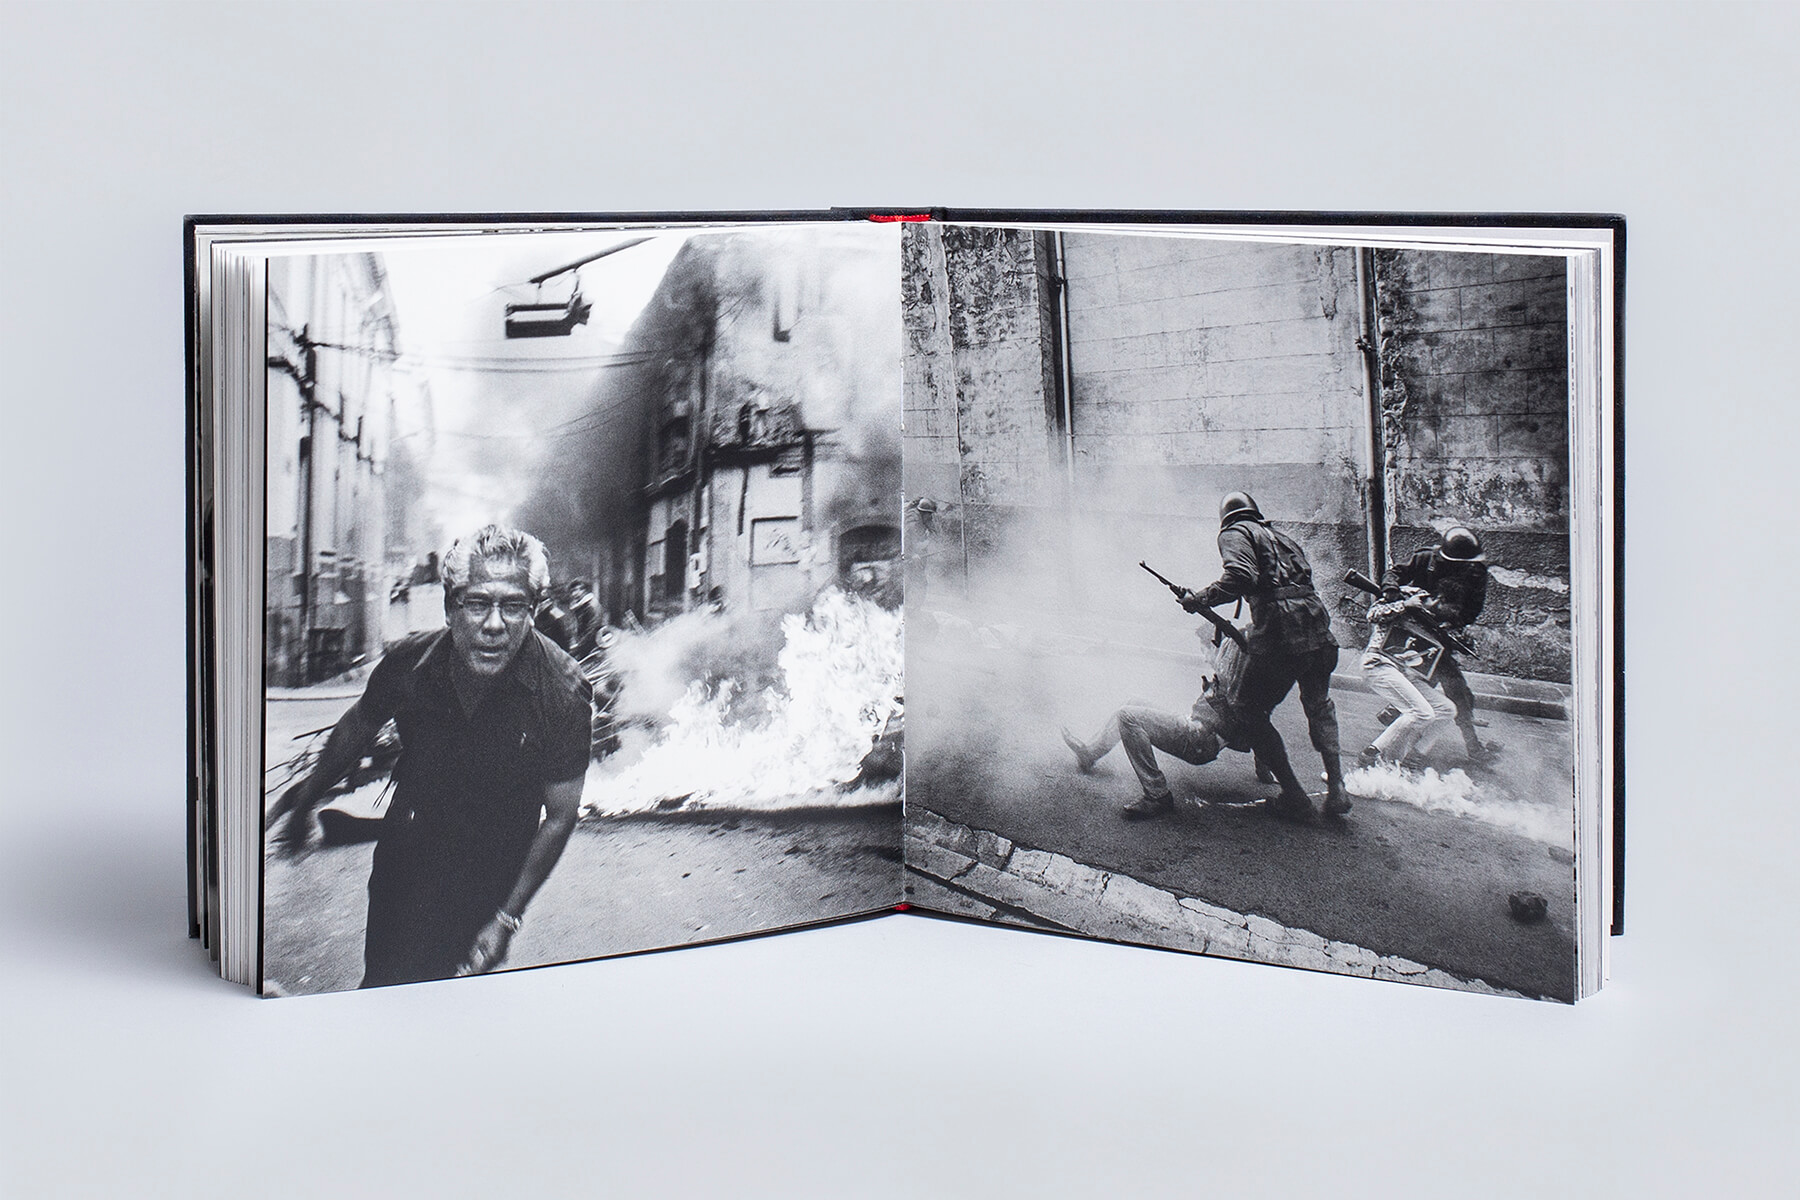 joao pina condor fotografia fabio cunha galerias municipais